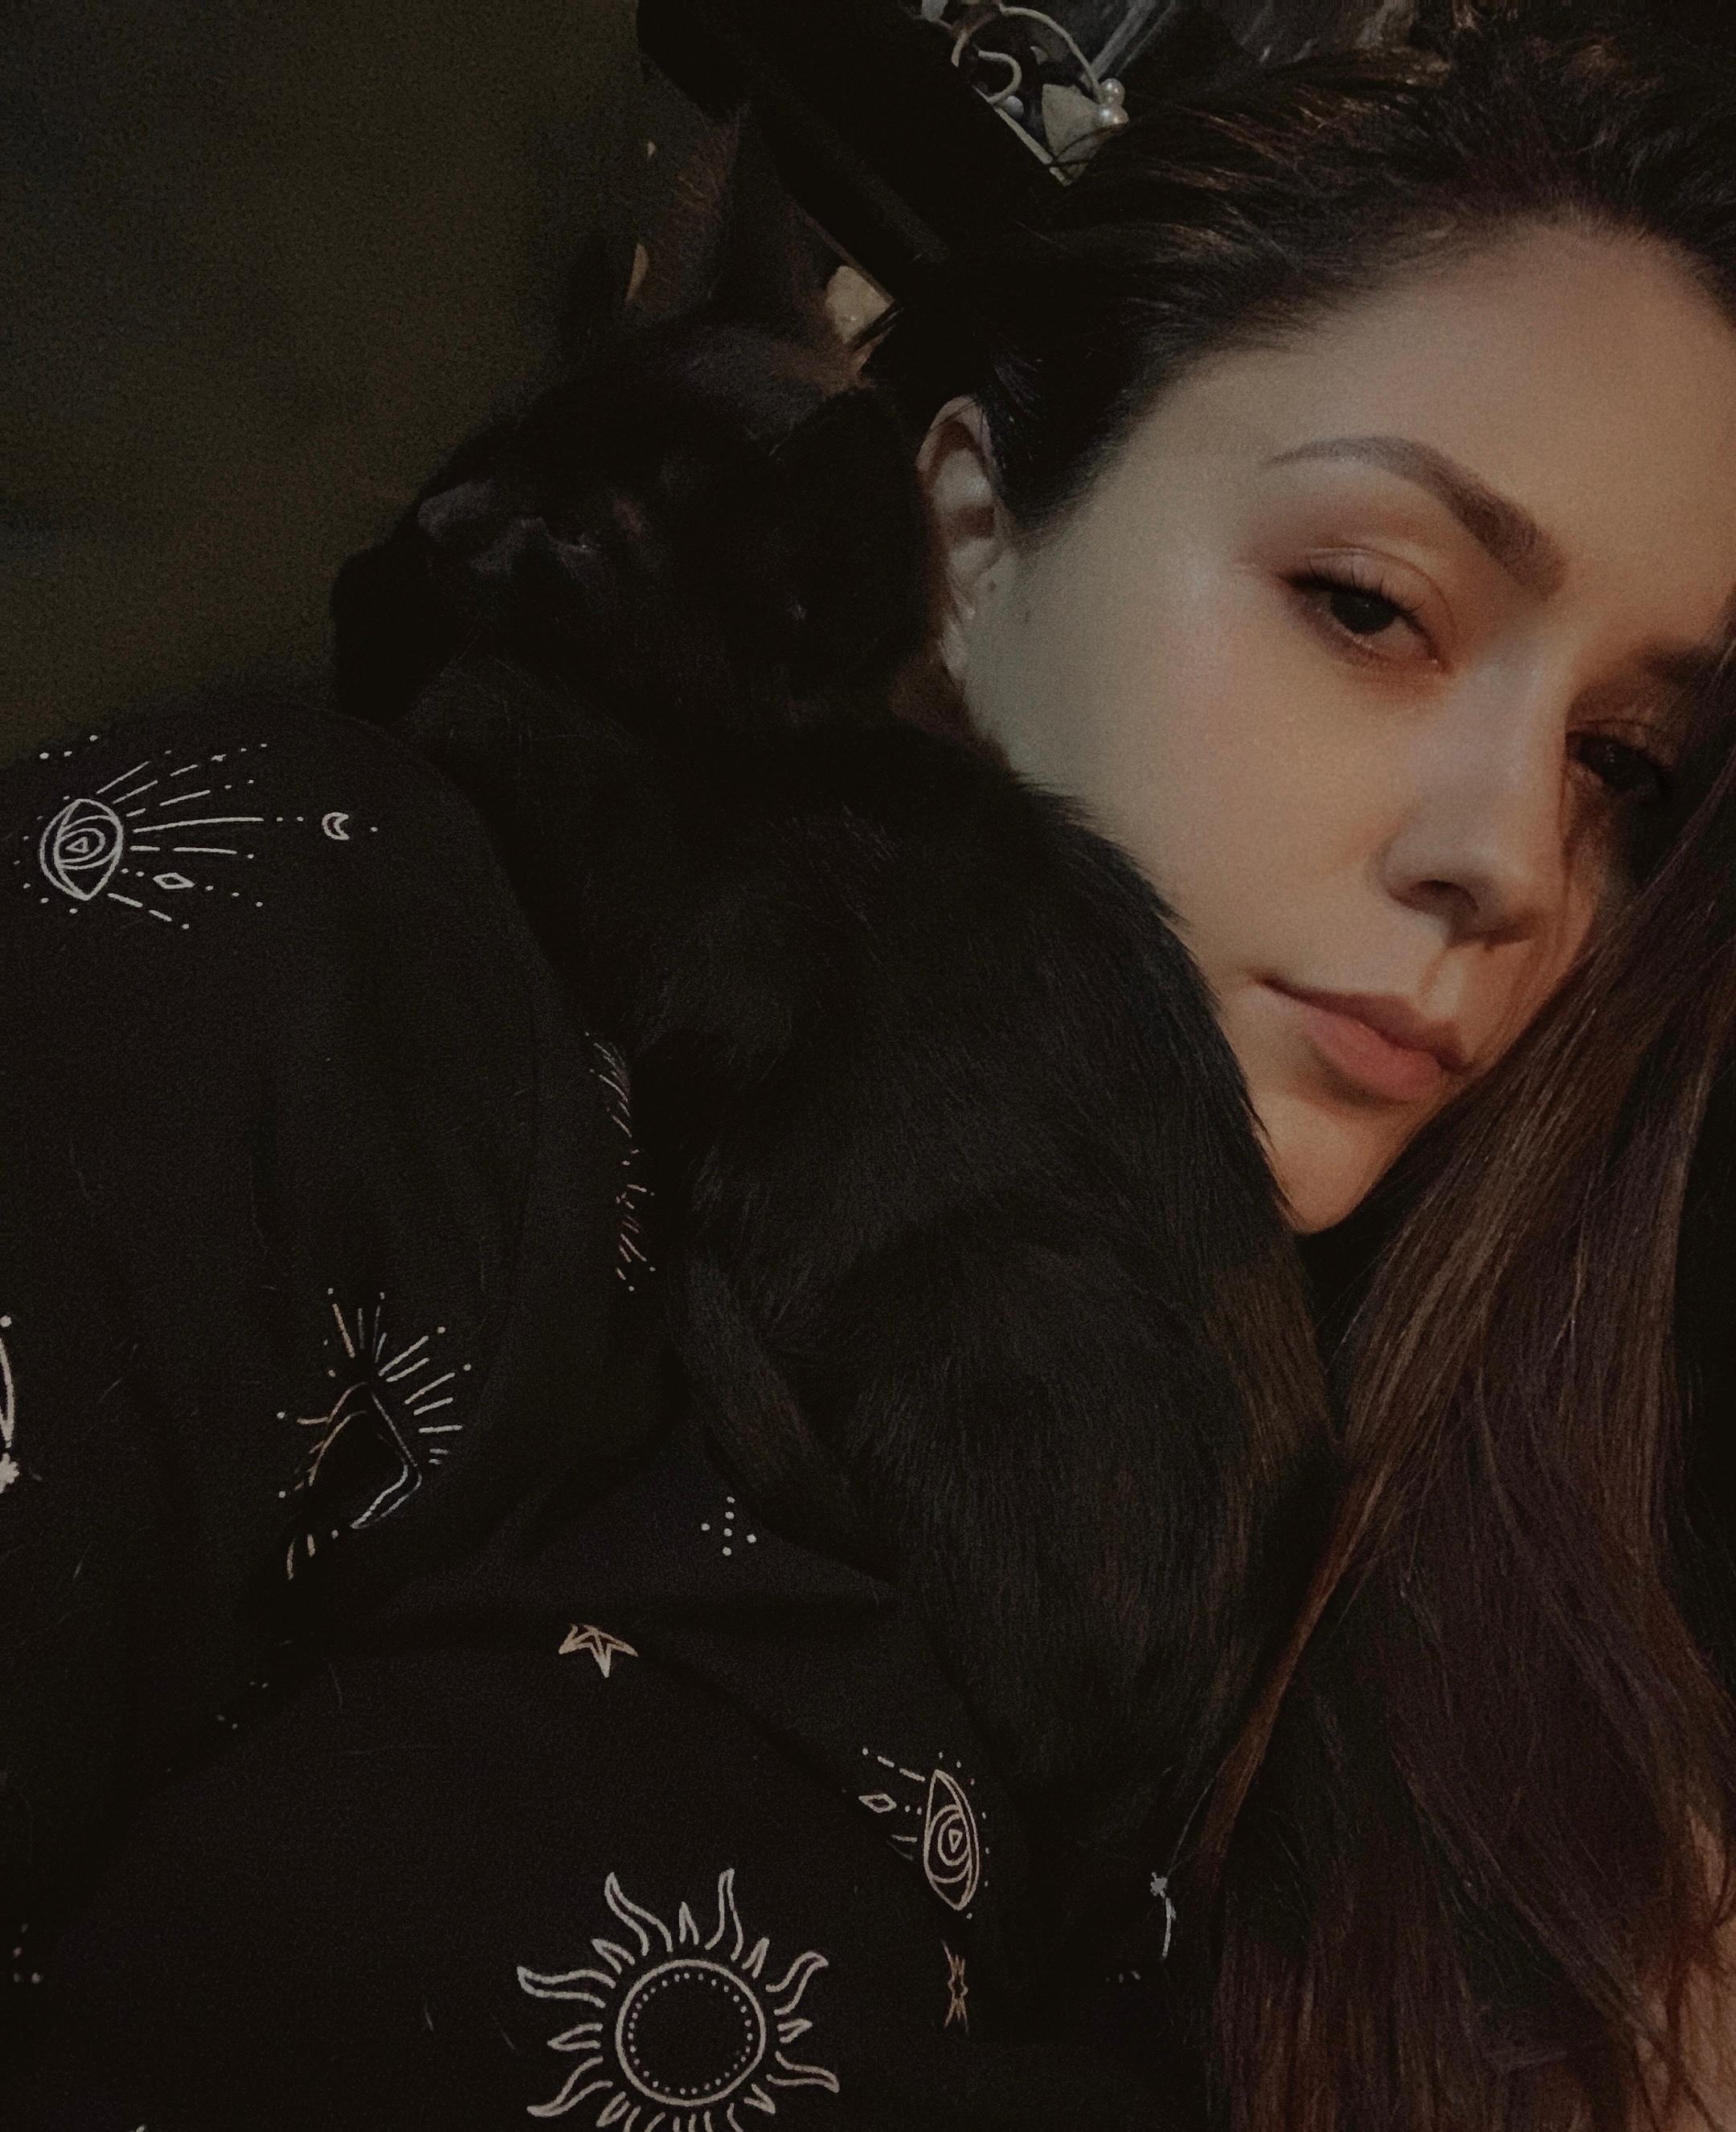 Nerwen Suicide | Alternative Model for SuicideGirls